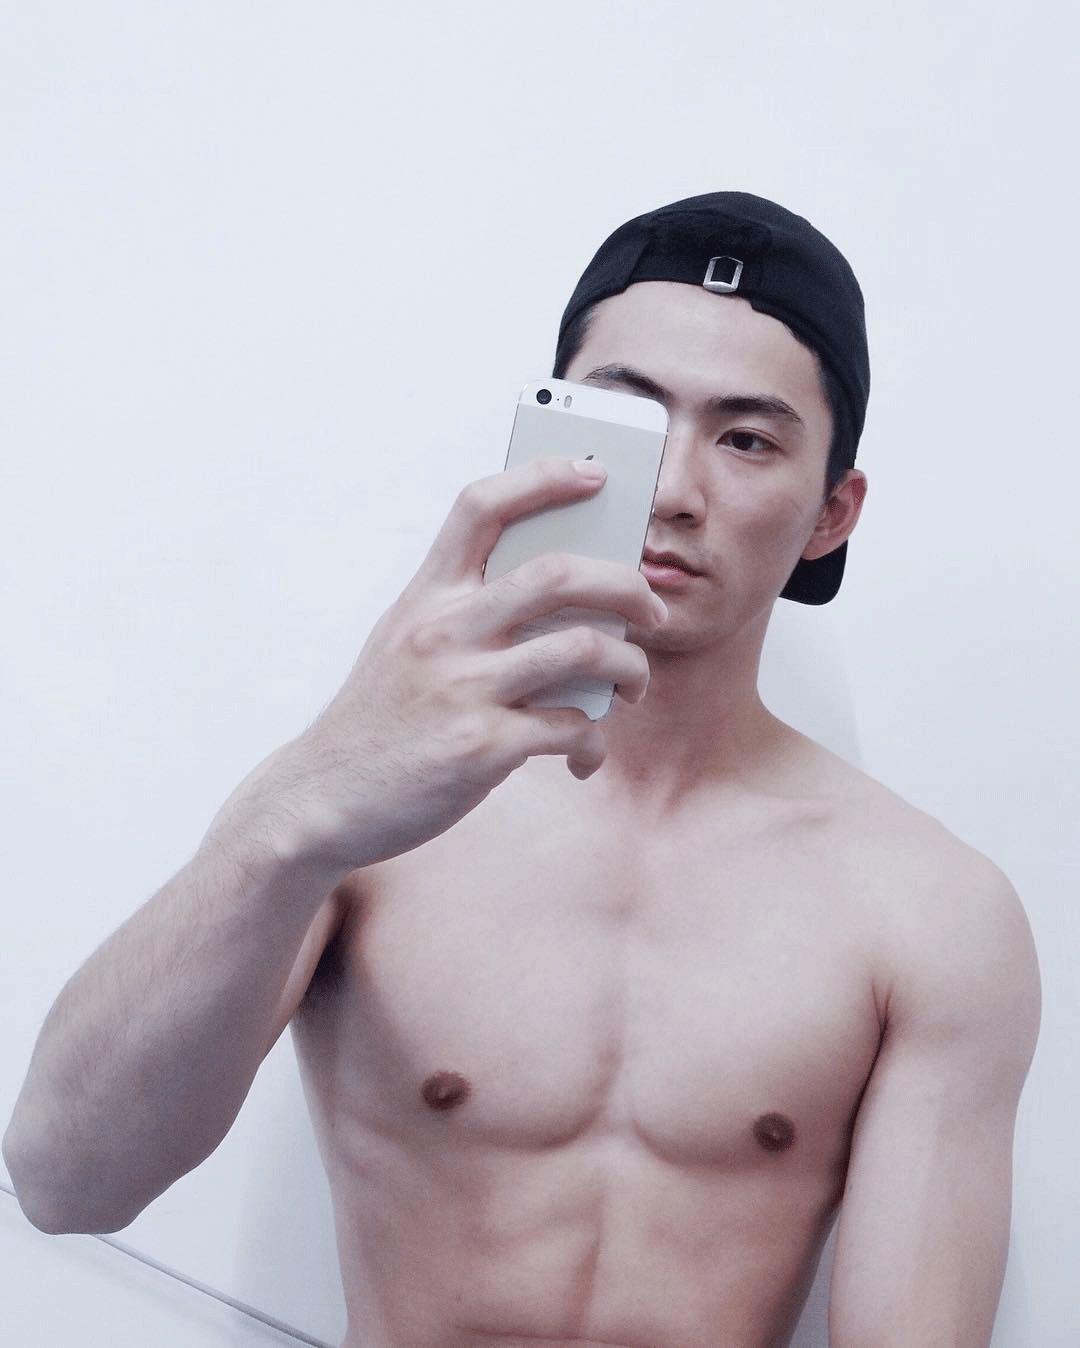 2018台湾Instagram天菜第1名了解一下